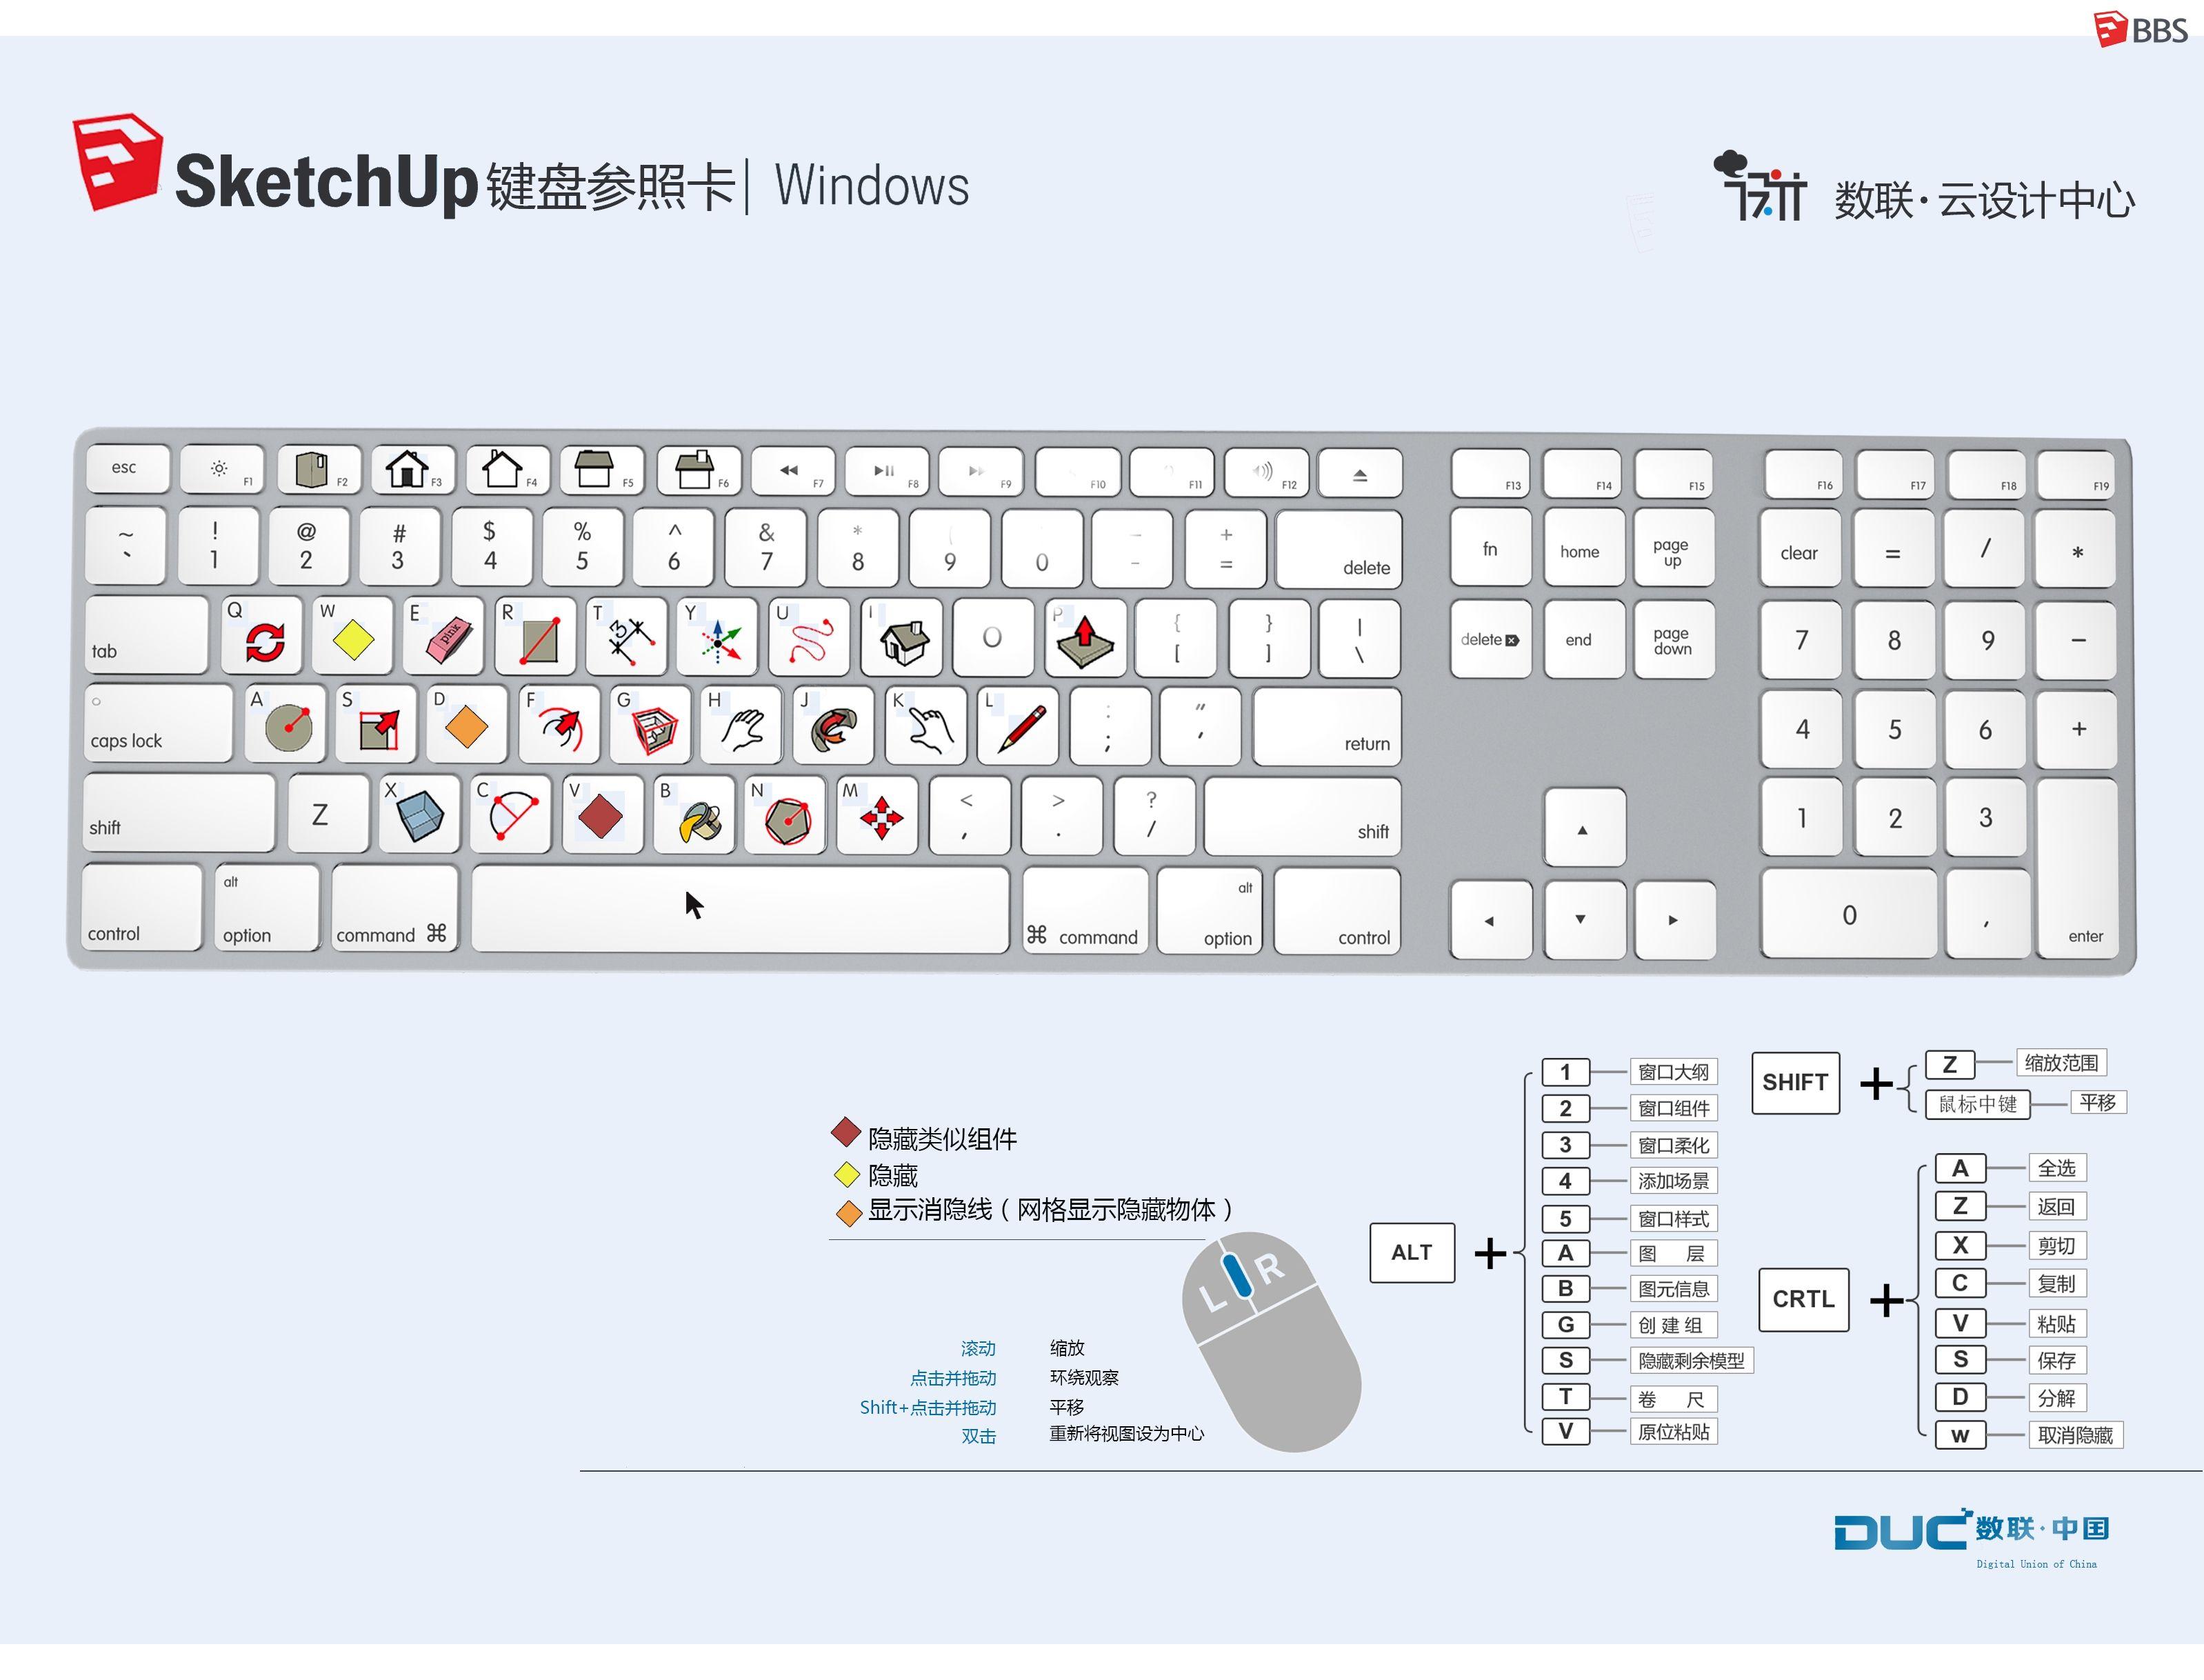 sketchup computer keyboard diagram tools  [ 3196 x 2436 Pixel ]